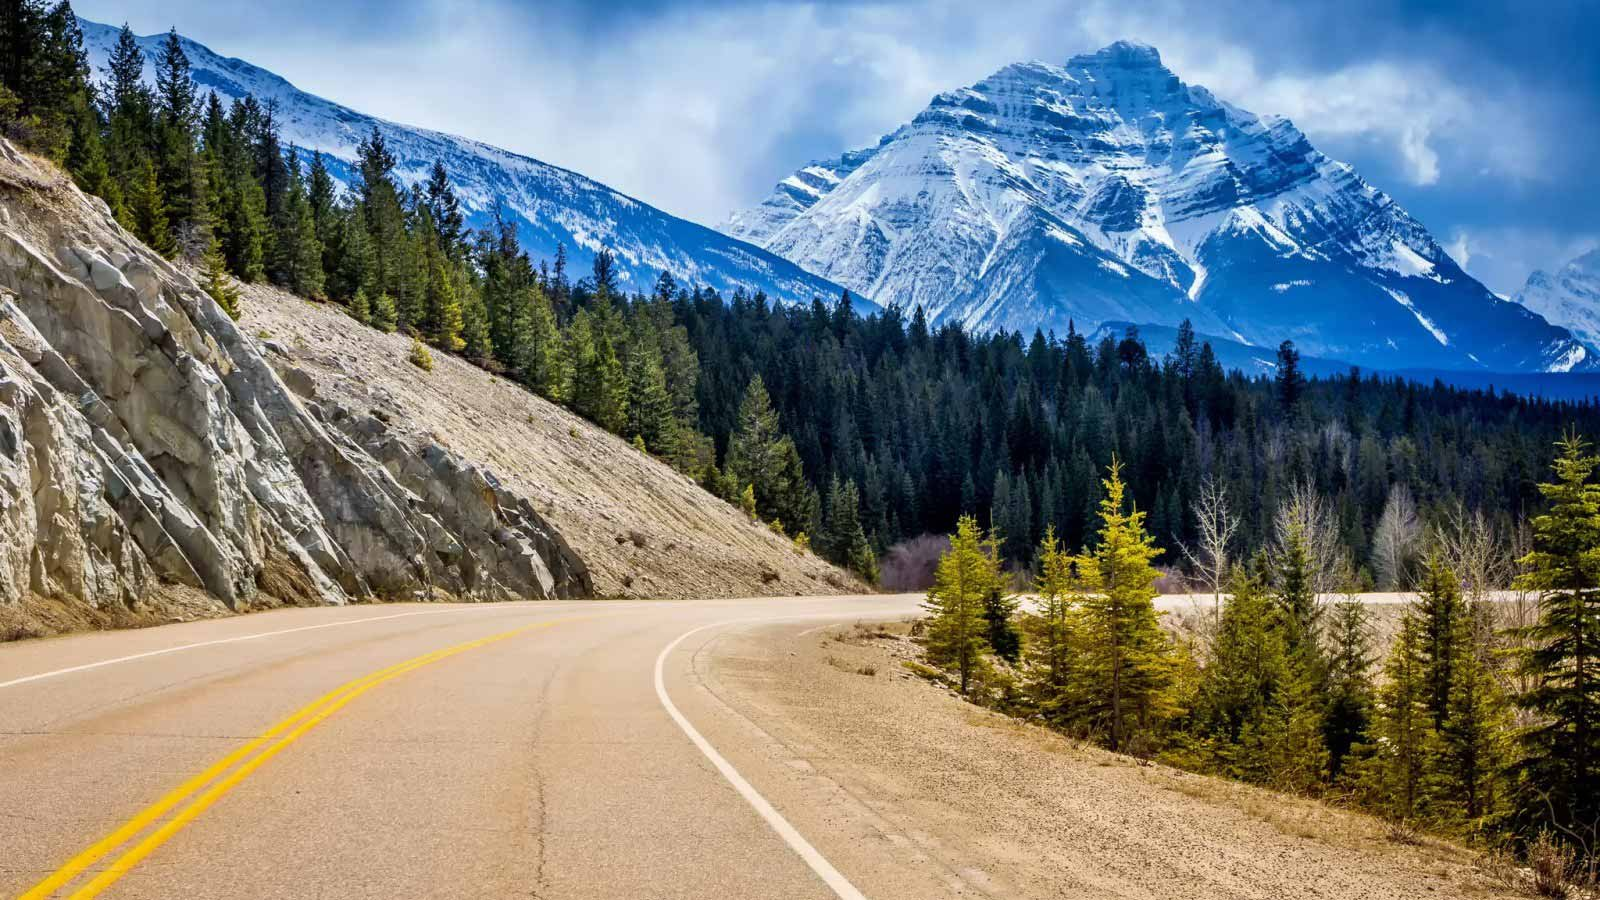 blue road nature photo - photo #36